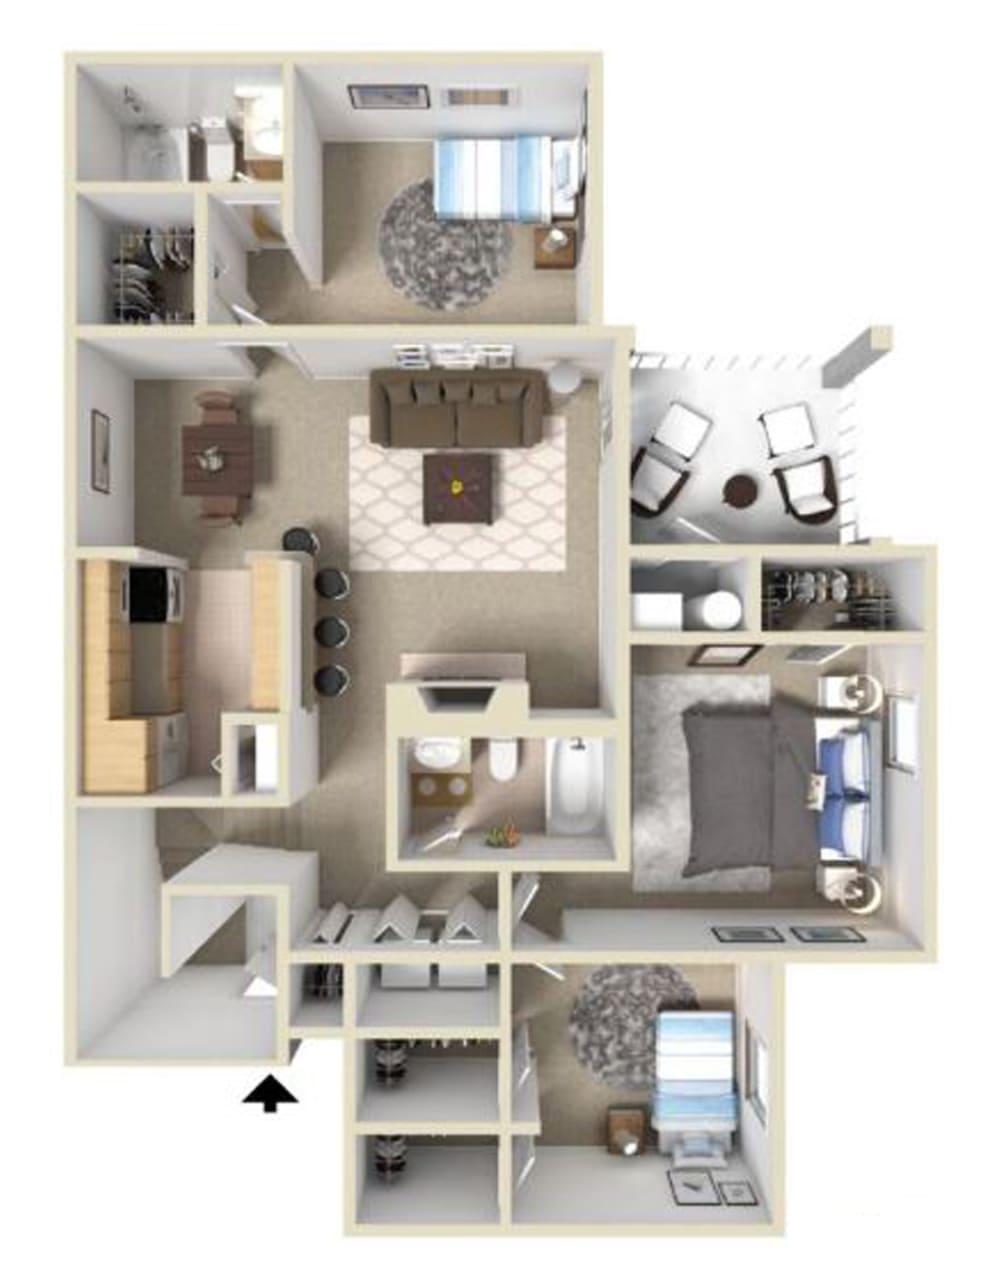 Westover II Floor Plan at Ashton Creek Apartments in Chester VA